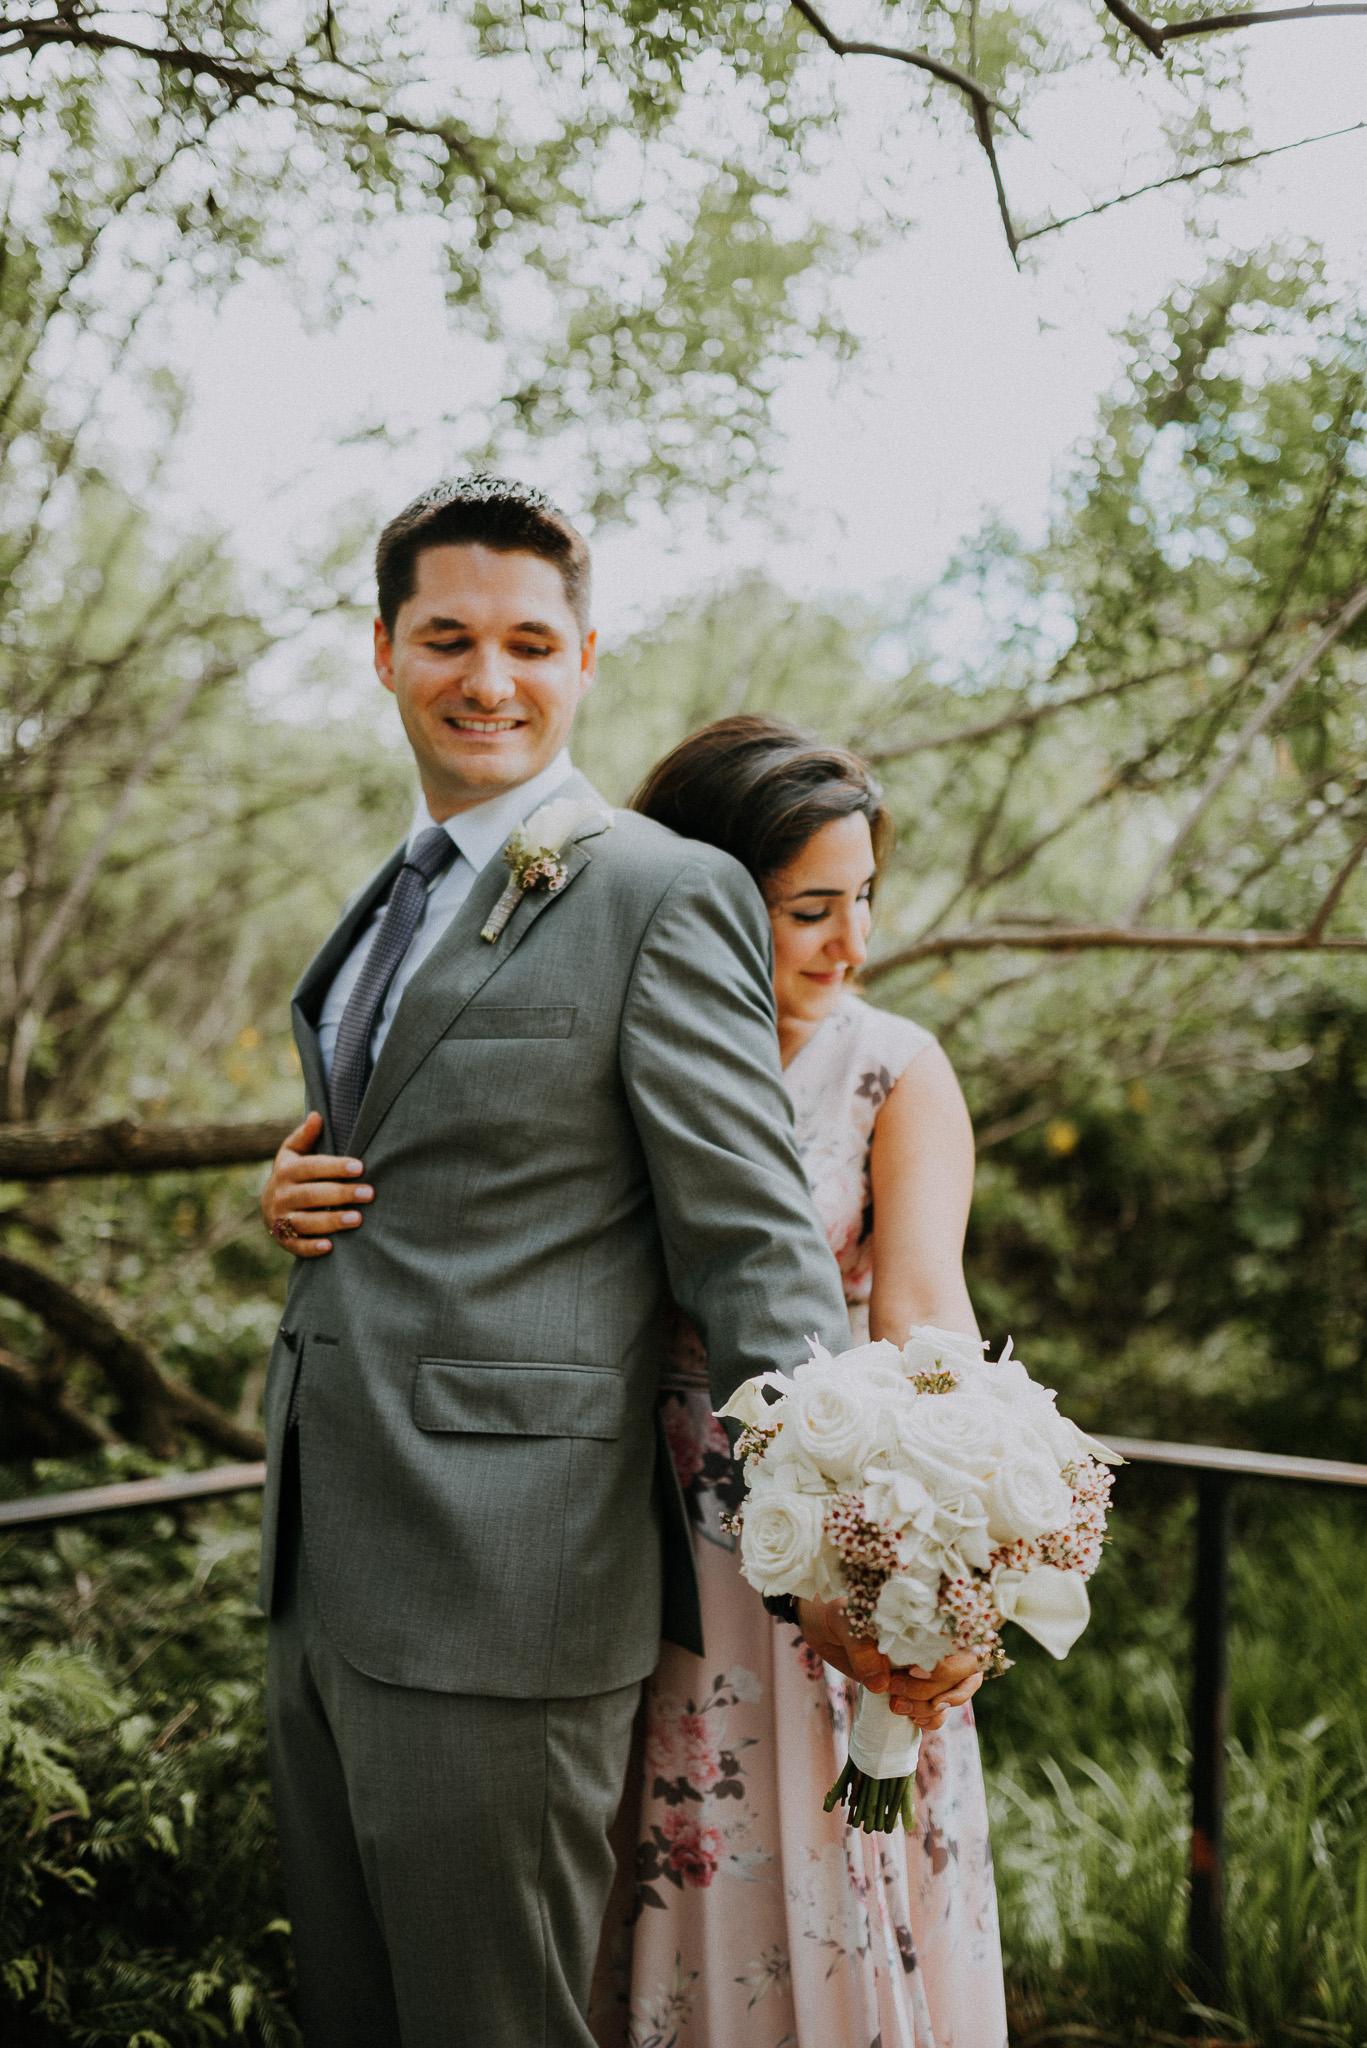 Dallas-fort-worth-wedding-photographer-dallas-arboretum-intimate-wedding-dallas-texas-02